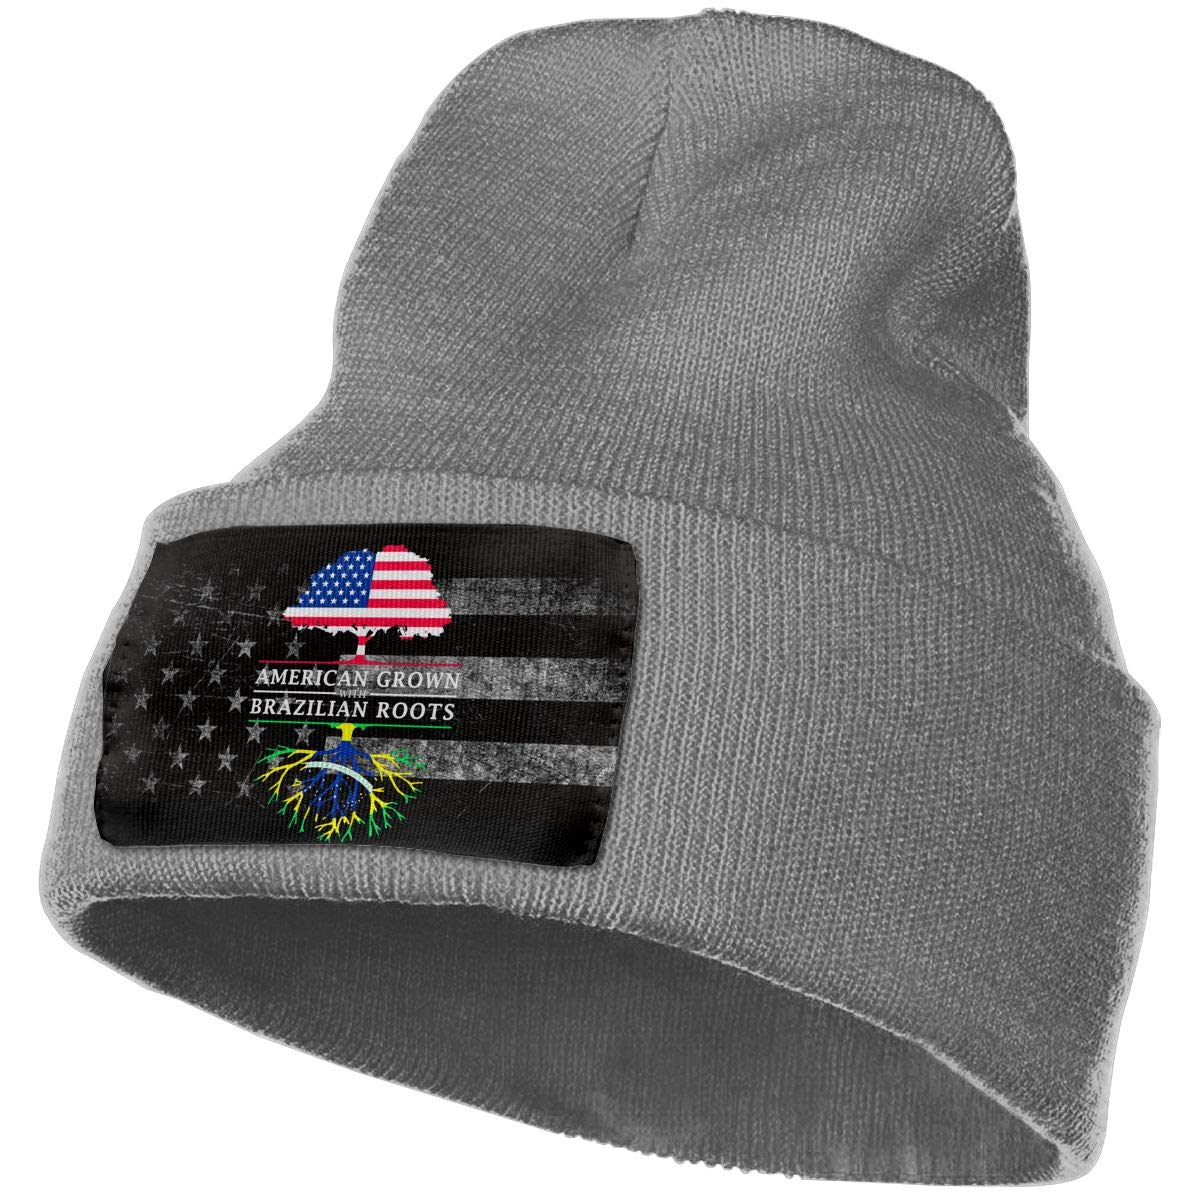 FORDSAN CP American Grown with Brazilian Roots Mens Beanie Cap Skull Cap Winter Warm Knitting Hats.